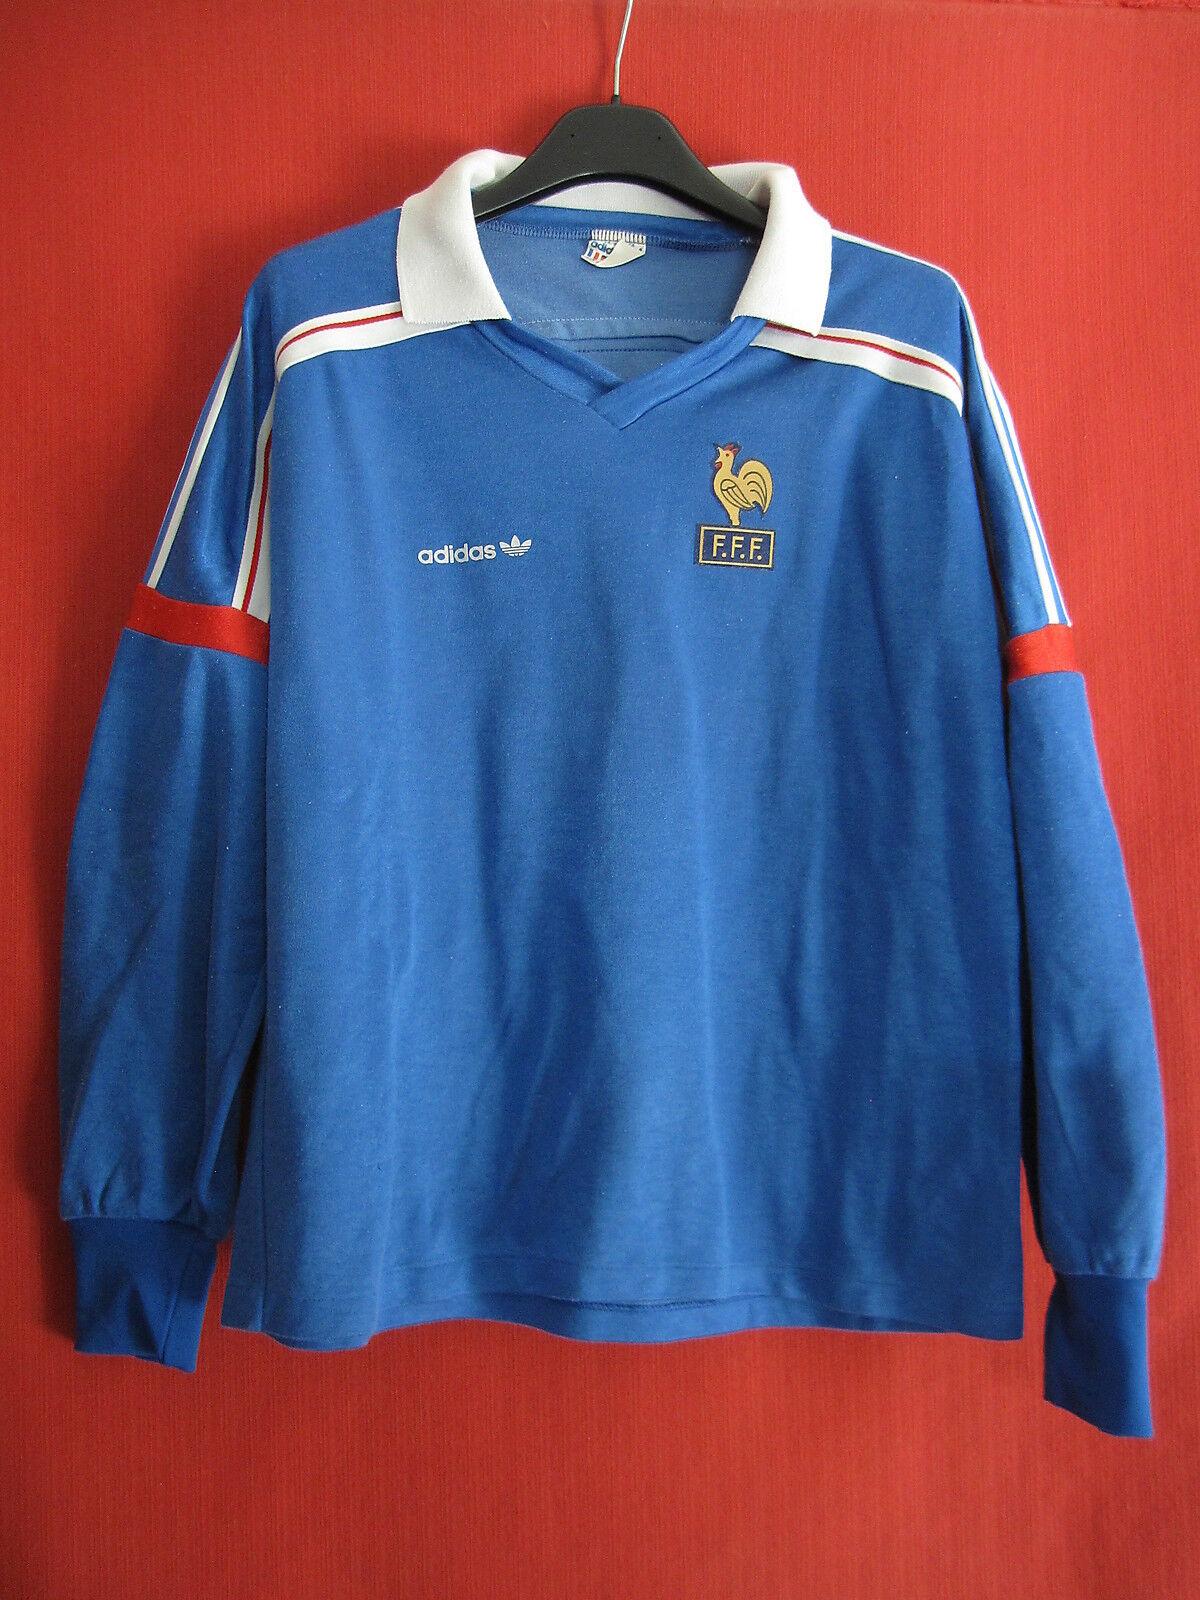 Maillot Equipe France 1986 Adidas Vintage Football Shirt ventex - S   M